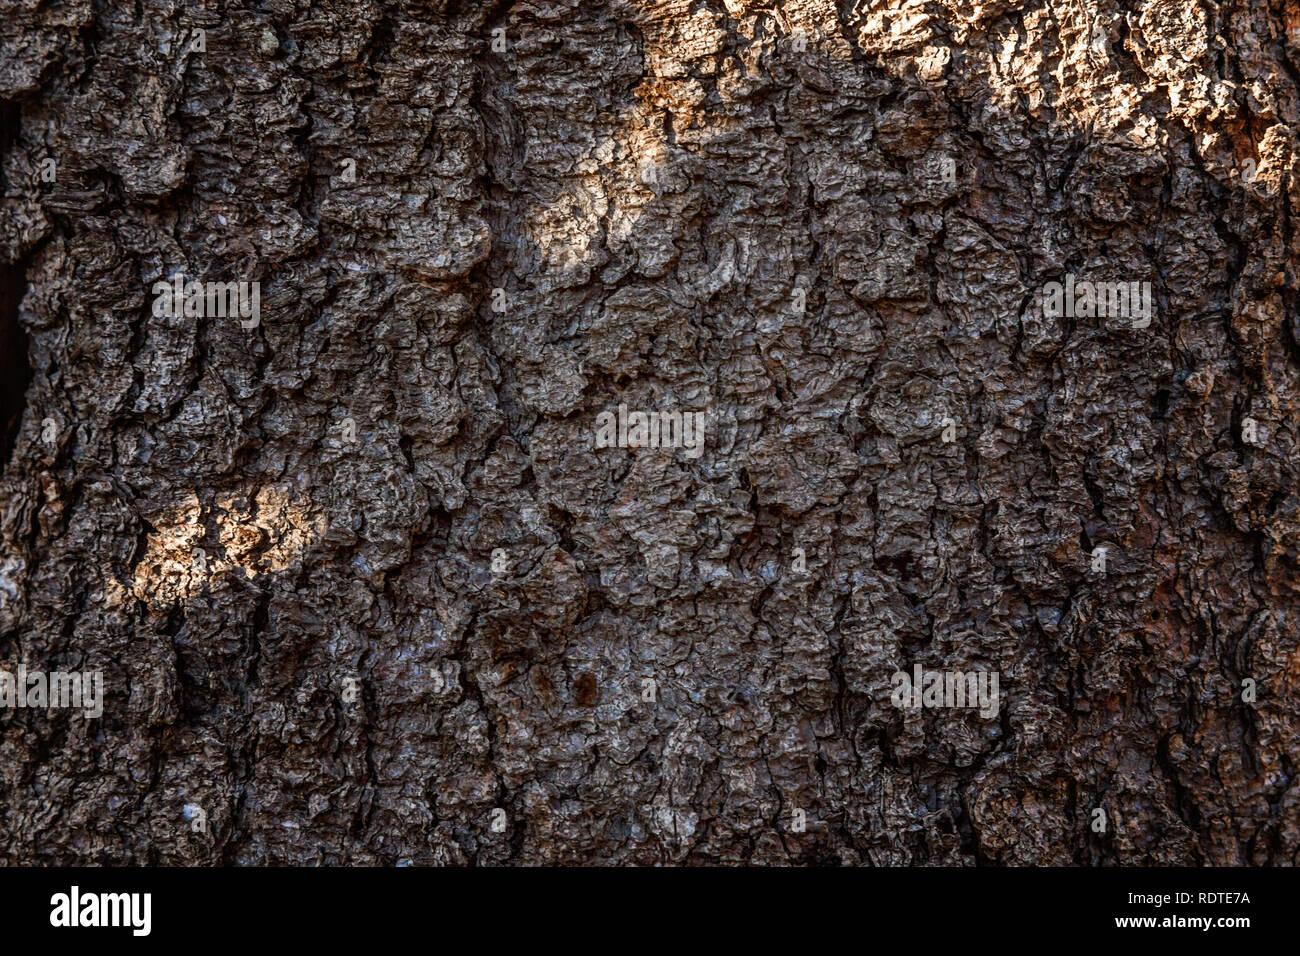 Bark Mulch Texture Stockfotos & Bark Mulch Texture Bilder